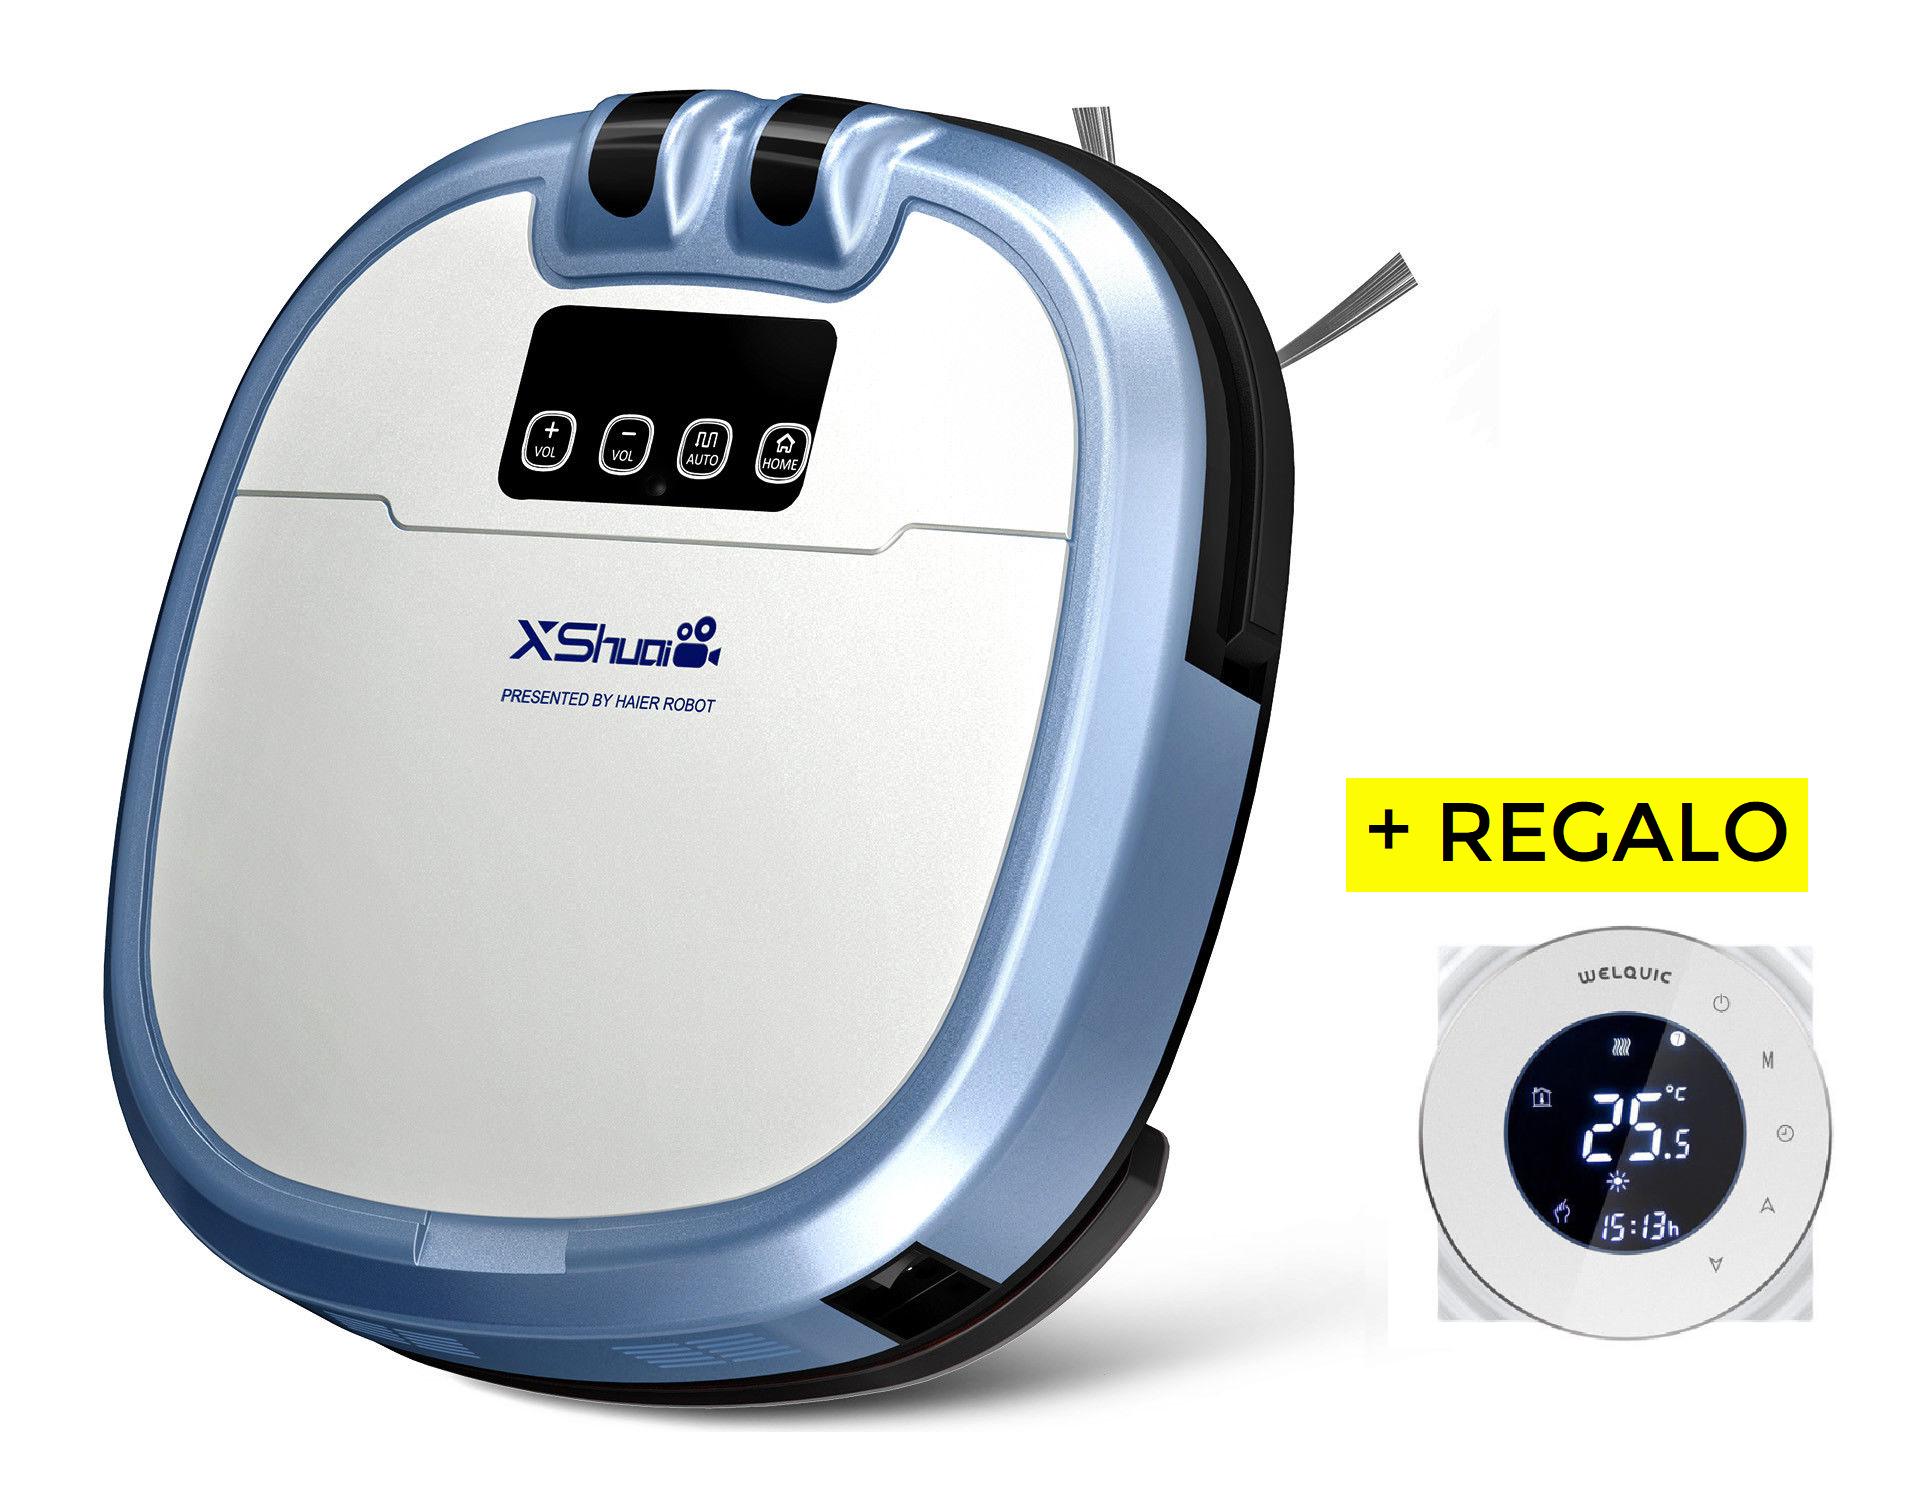 HAIER XSHUAI C3 + termostato solo 89.9€